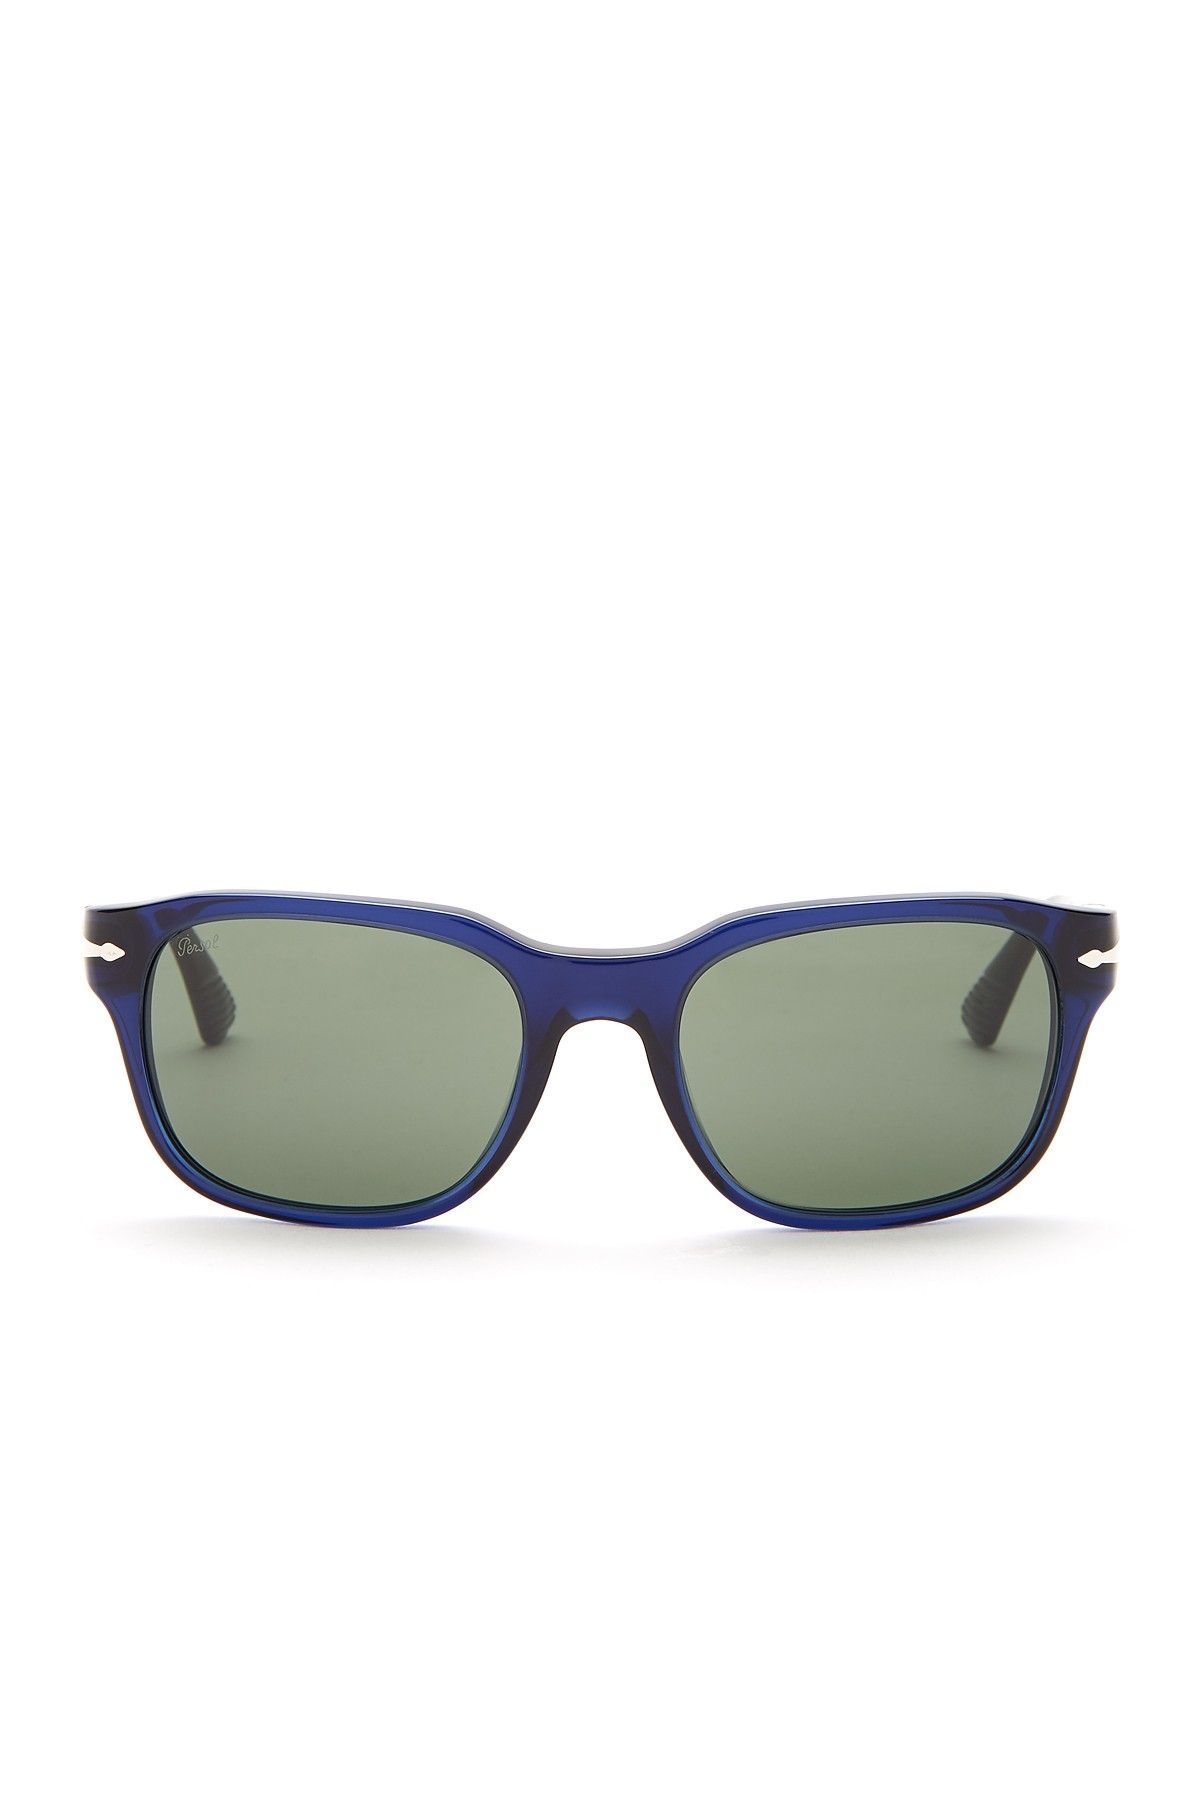 1f76ea6842 Lyst - Persol Men  39 s Film Noir Acetate Sunglasses in Blue for Men